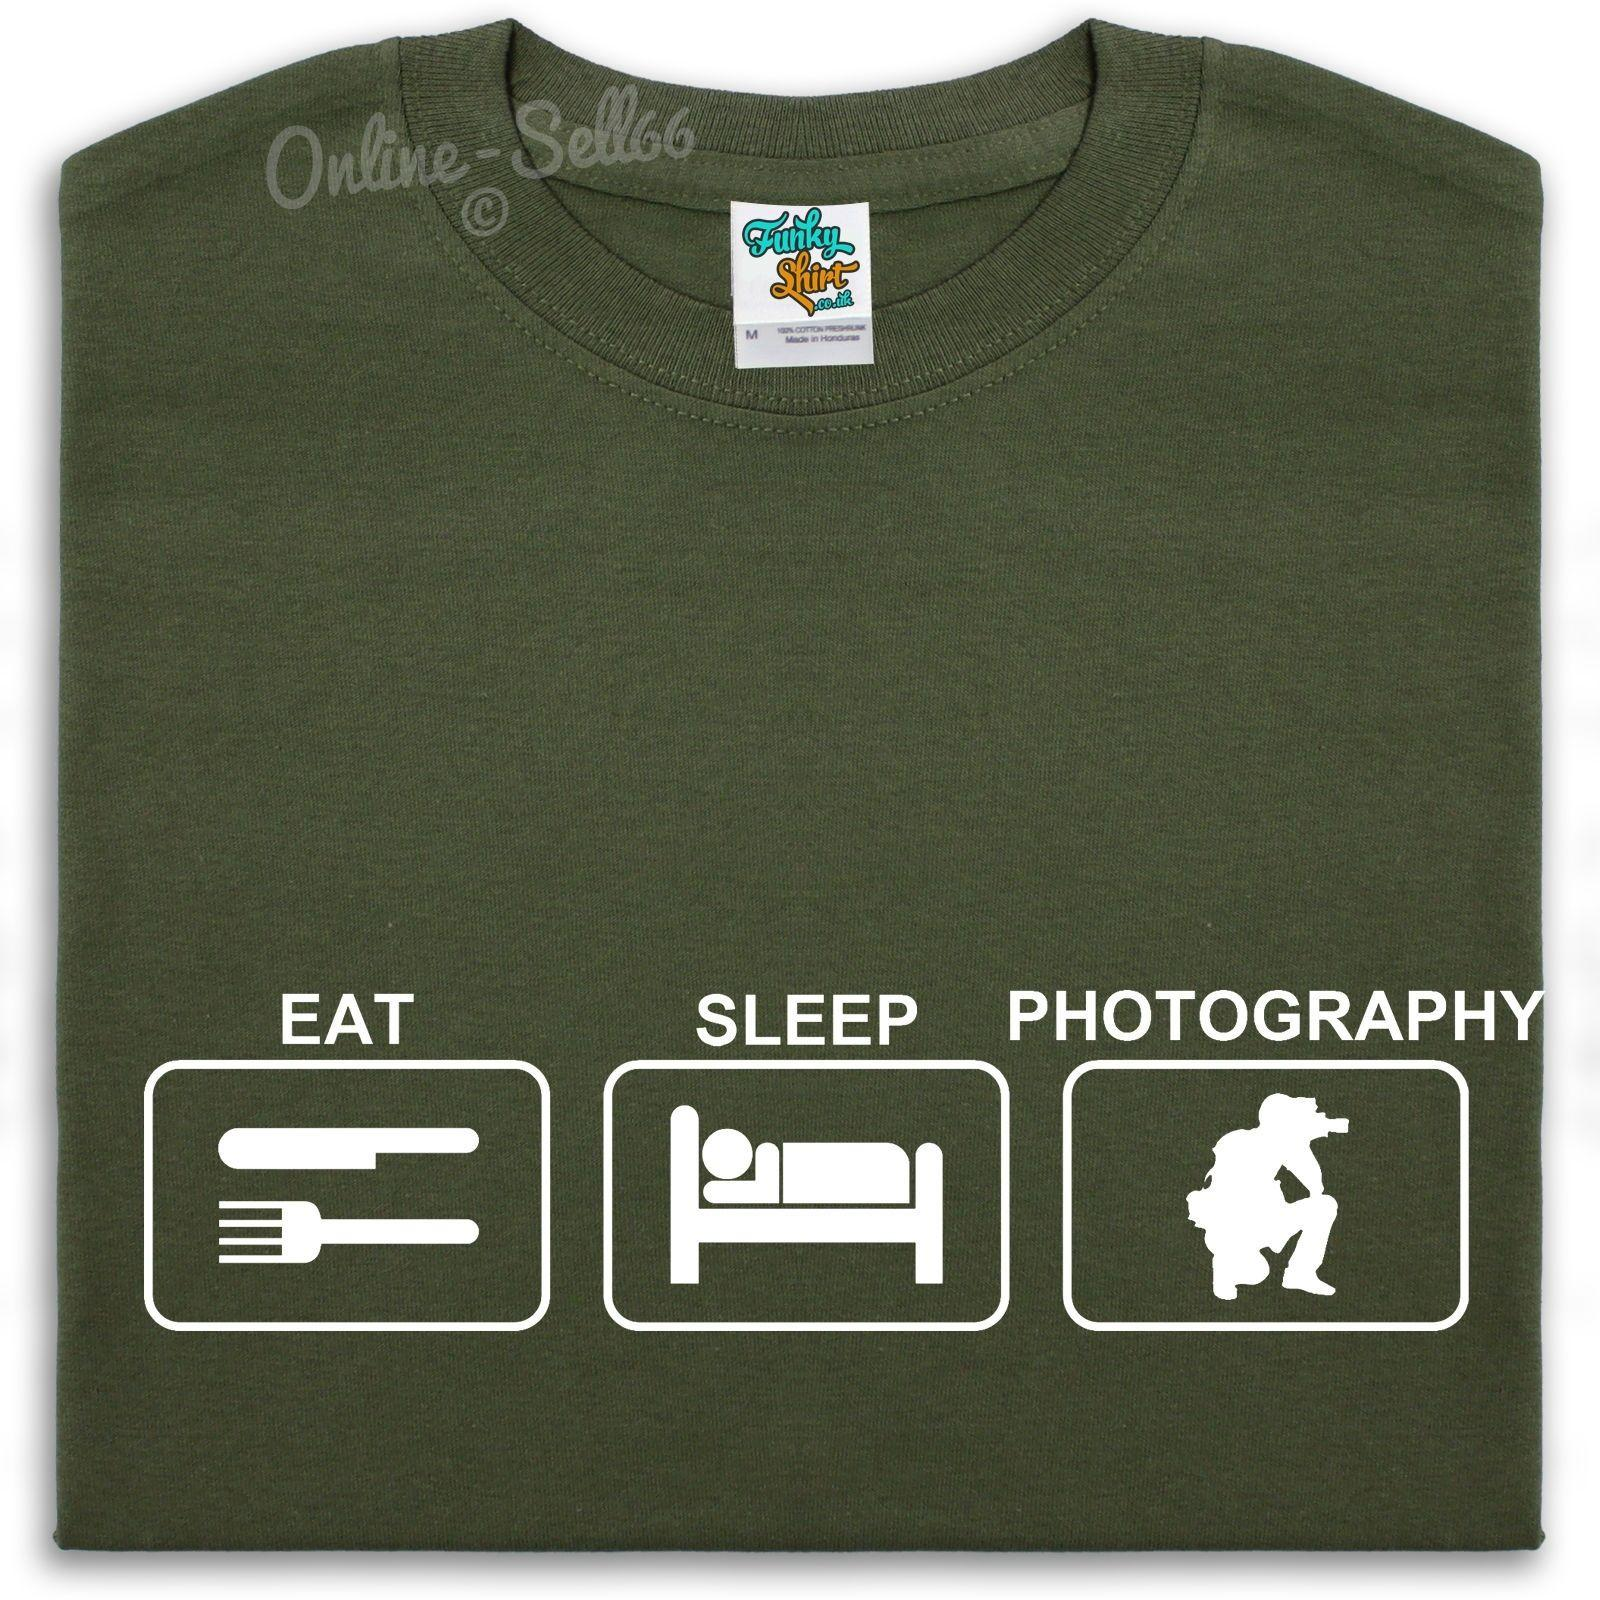 5449d82a29 Eat Sleep Photography T Shirt Mens Boys Womens Photographer Film Camera Gift  Cool Casual Pride T Shirt Men Unisex New Fashion Make Your Own Tee Shirt  Design ...